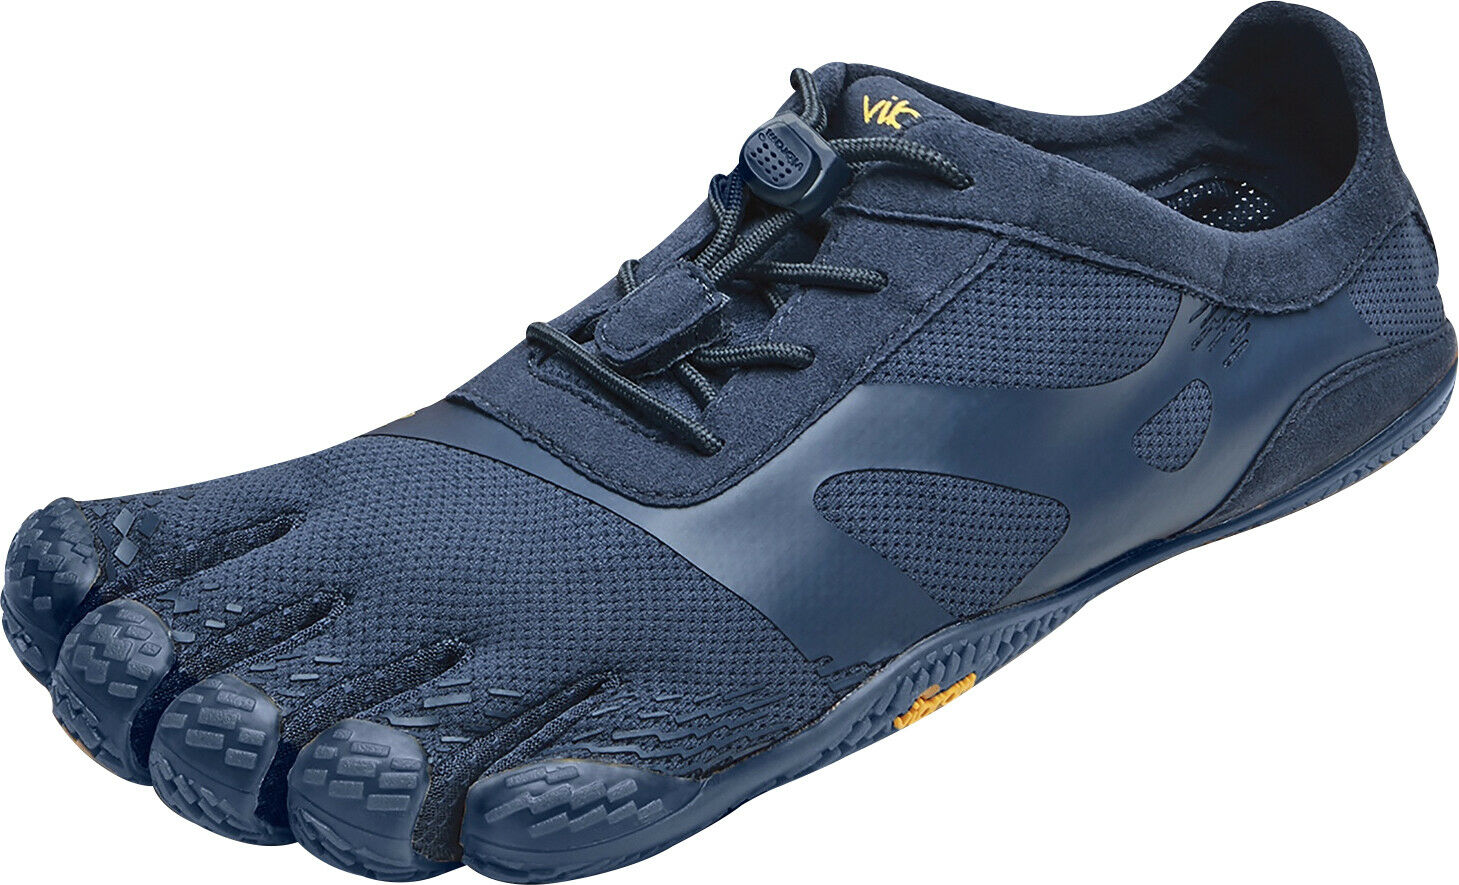 Vibram FiveFingers KSO EVO Mens Running  shoes - Navy  fast delivery